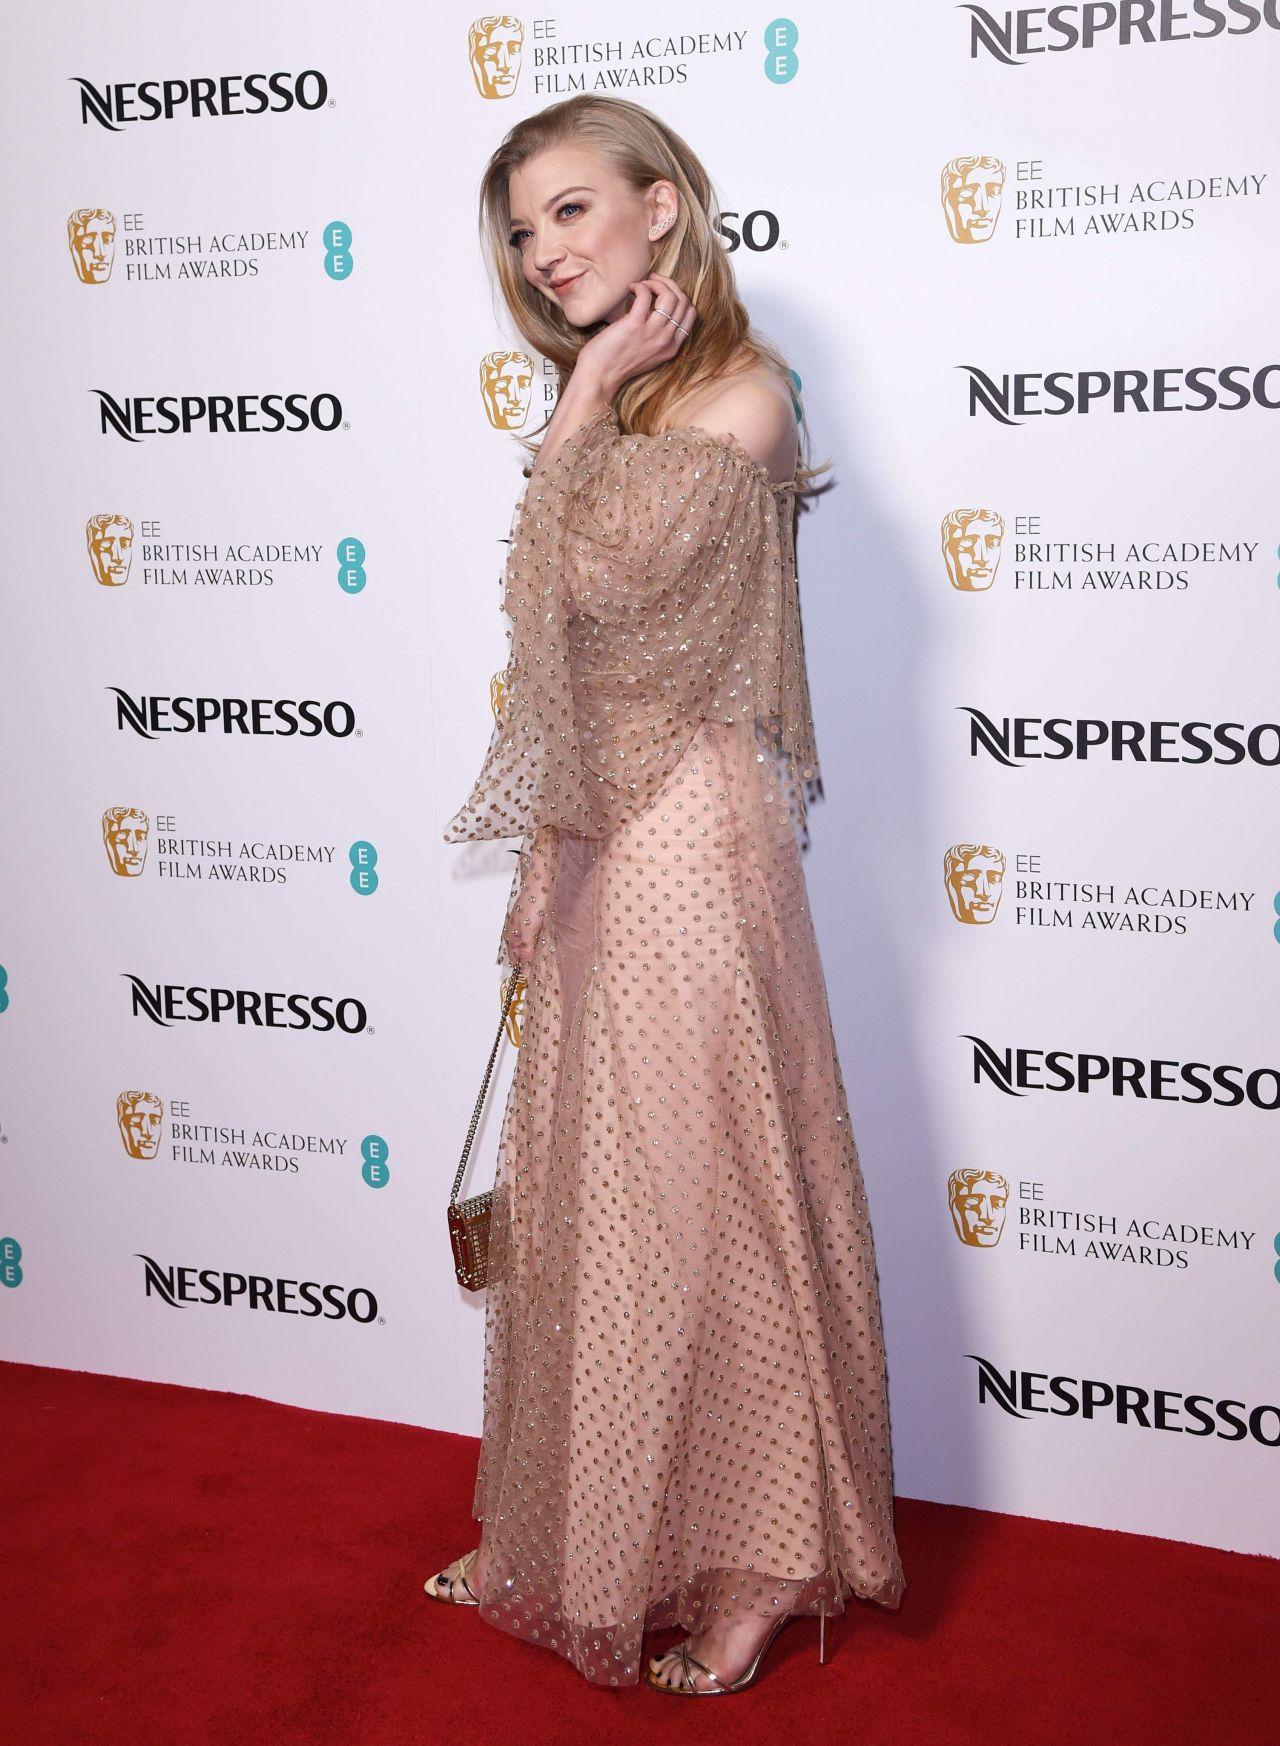 http://celebmafia.com/wp-content/uploads/2018/02/natalie-dormer-british-academy-film-awards-nominees-party-in-london-6.jpg